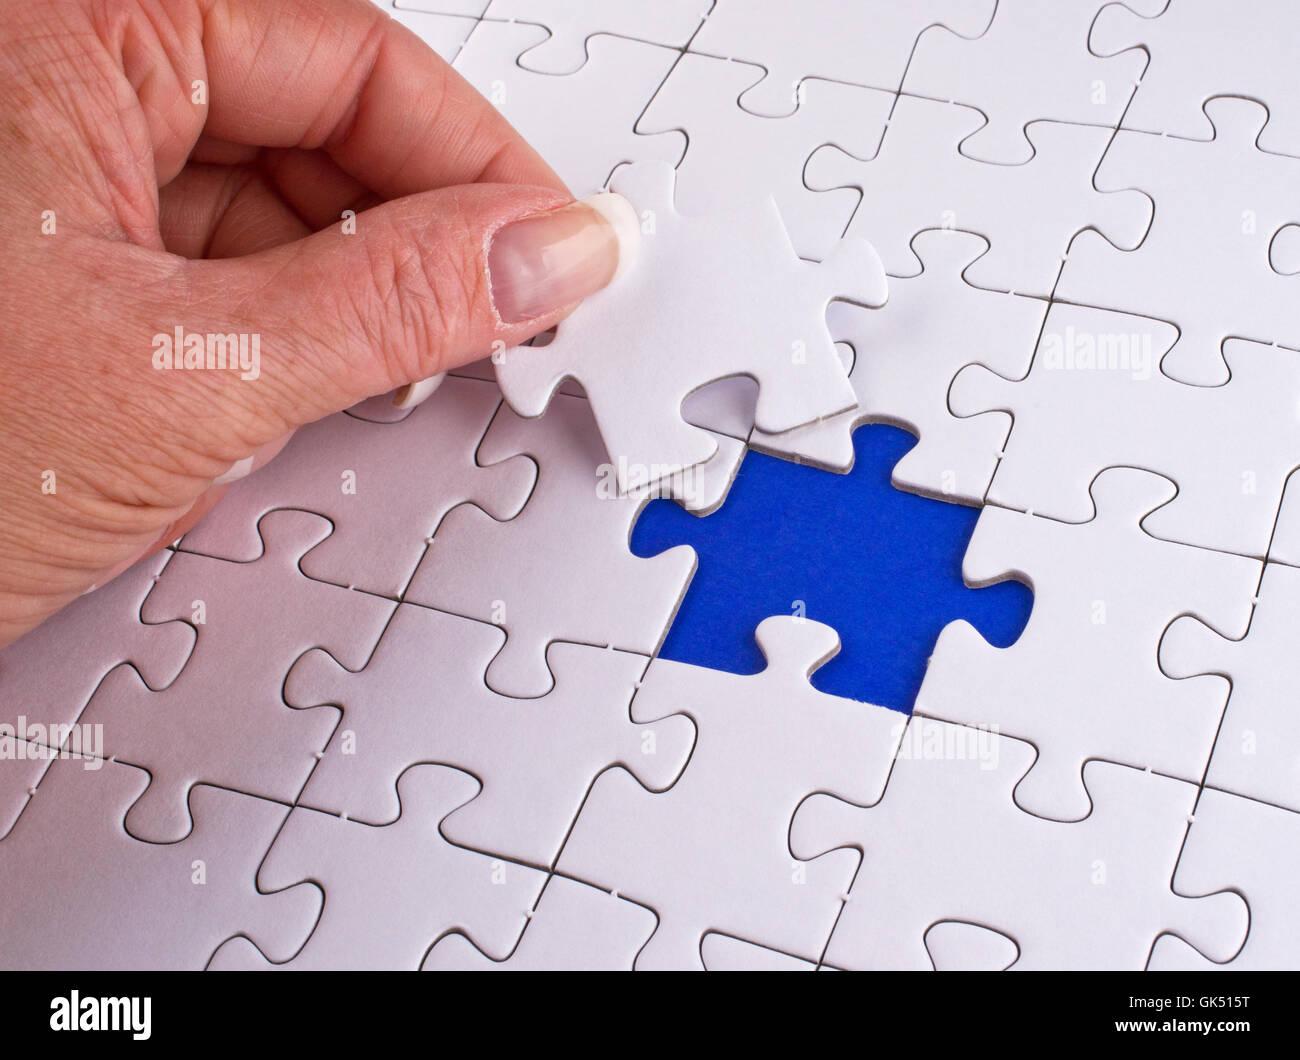 jigsaw puzzle jigsaw puzzle - Stock Image